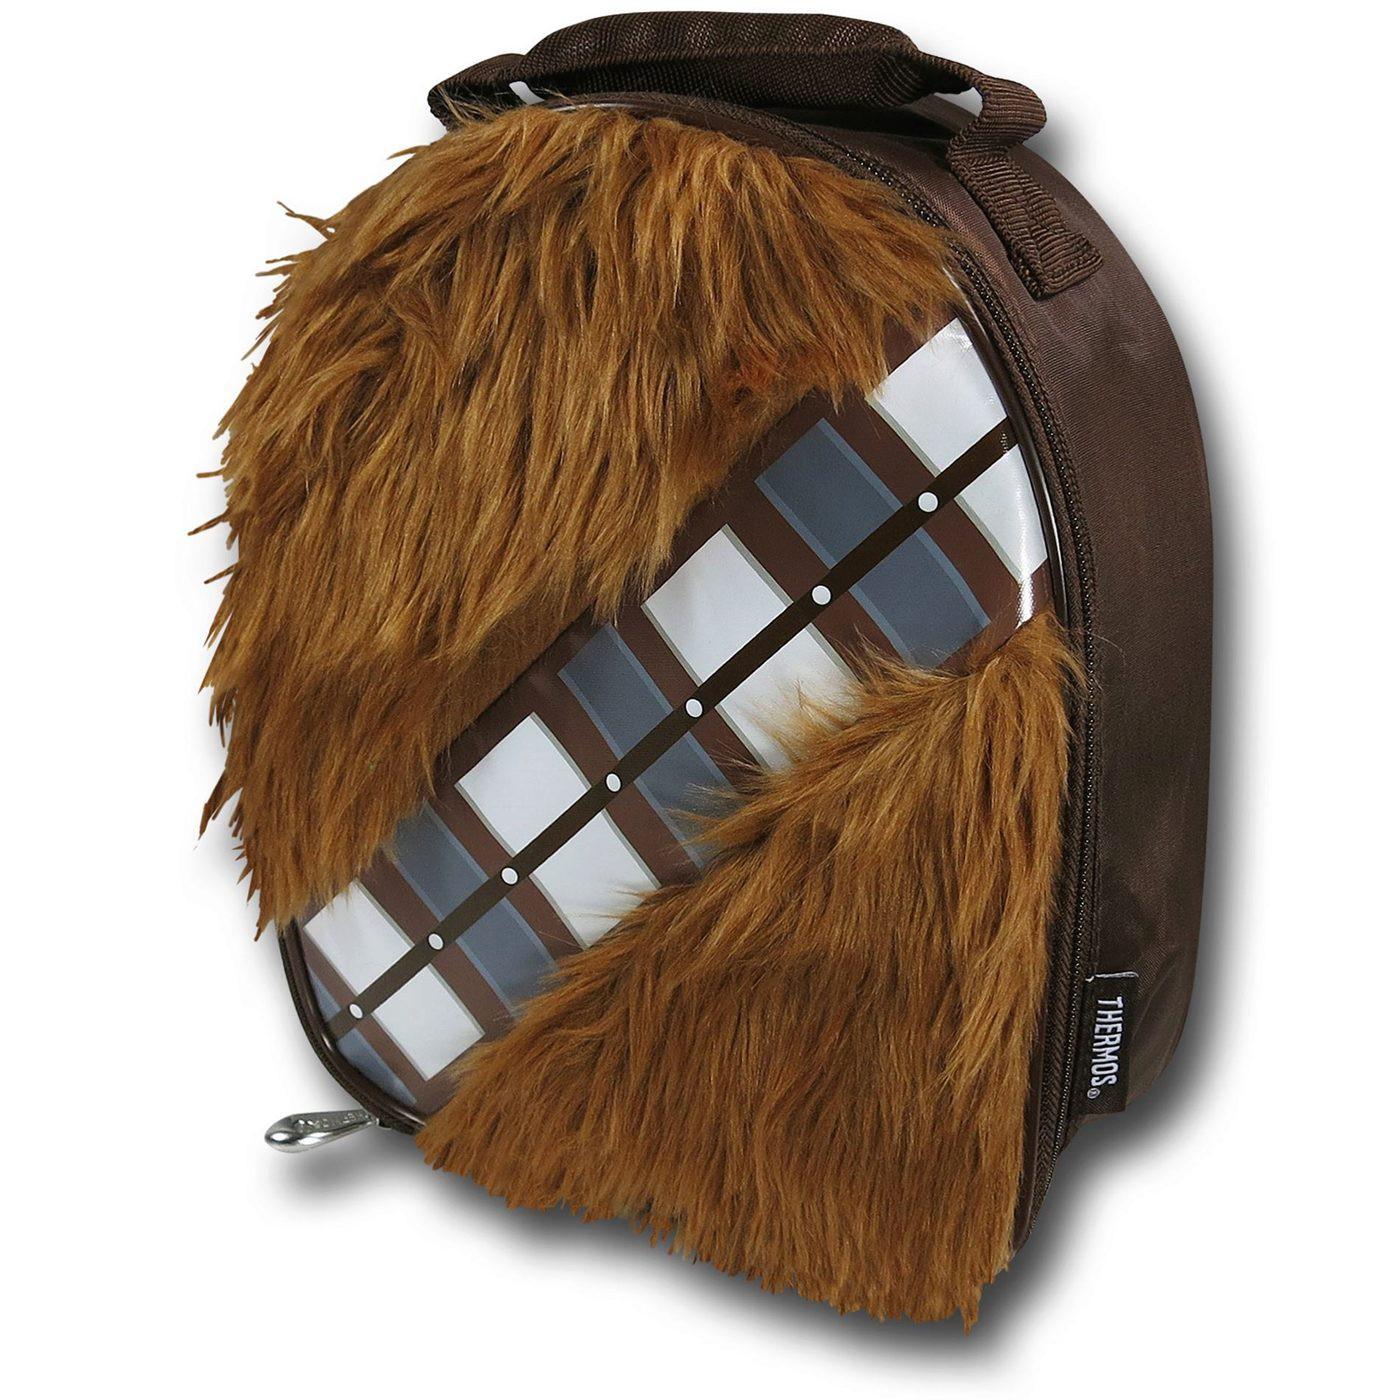 Star Wars Chewbacca Belt Lunch Box